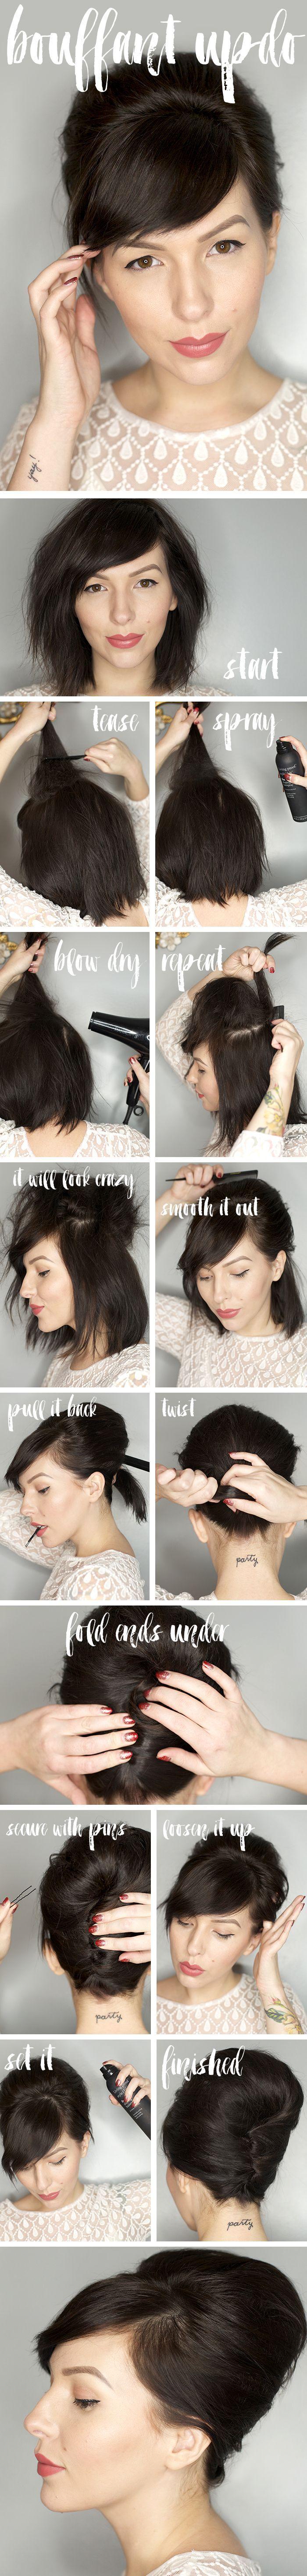 Bouffant Updo Hair Tutorial (keiko lynn) - http://hairstylezones.com/2016/06/12/bouffant-updo-hair-tutorial-keiko-lynn/